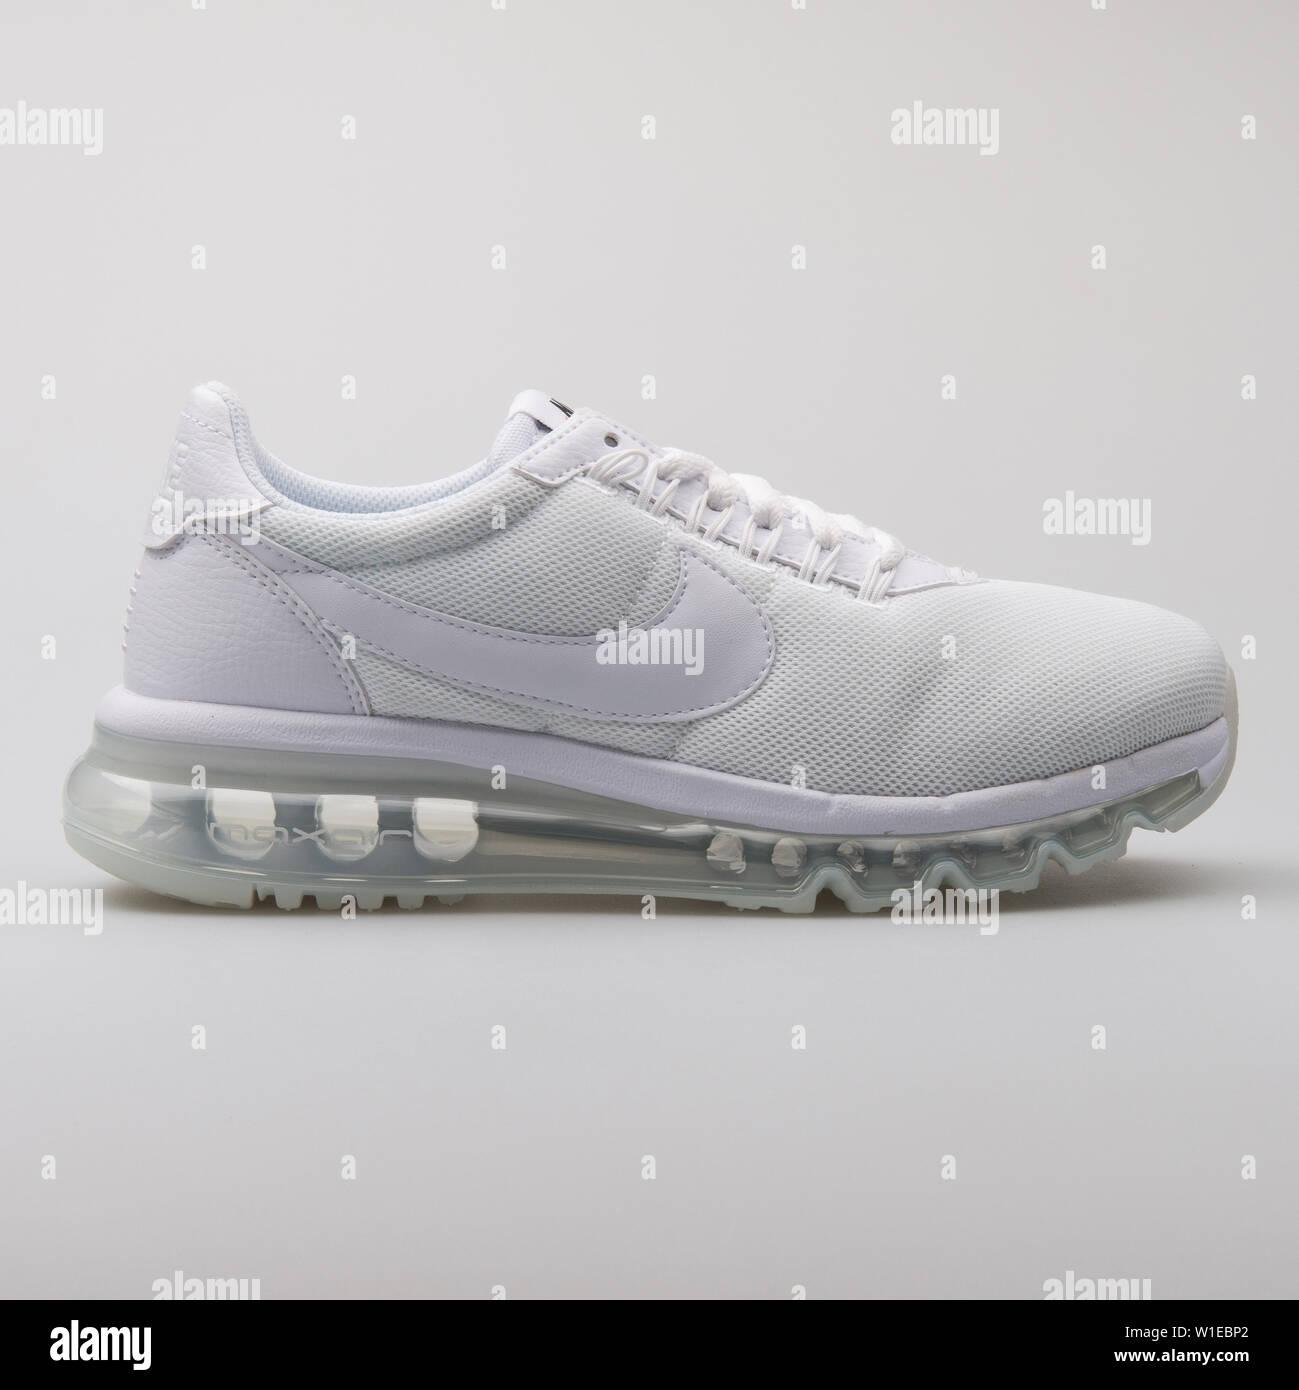 promo code 3f694 4e823 VIENNA, AUSTRIA - AUGUST 7, 2017: Nike Air Max LD Zero white ...